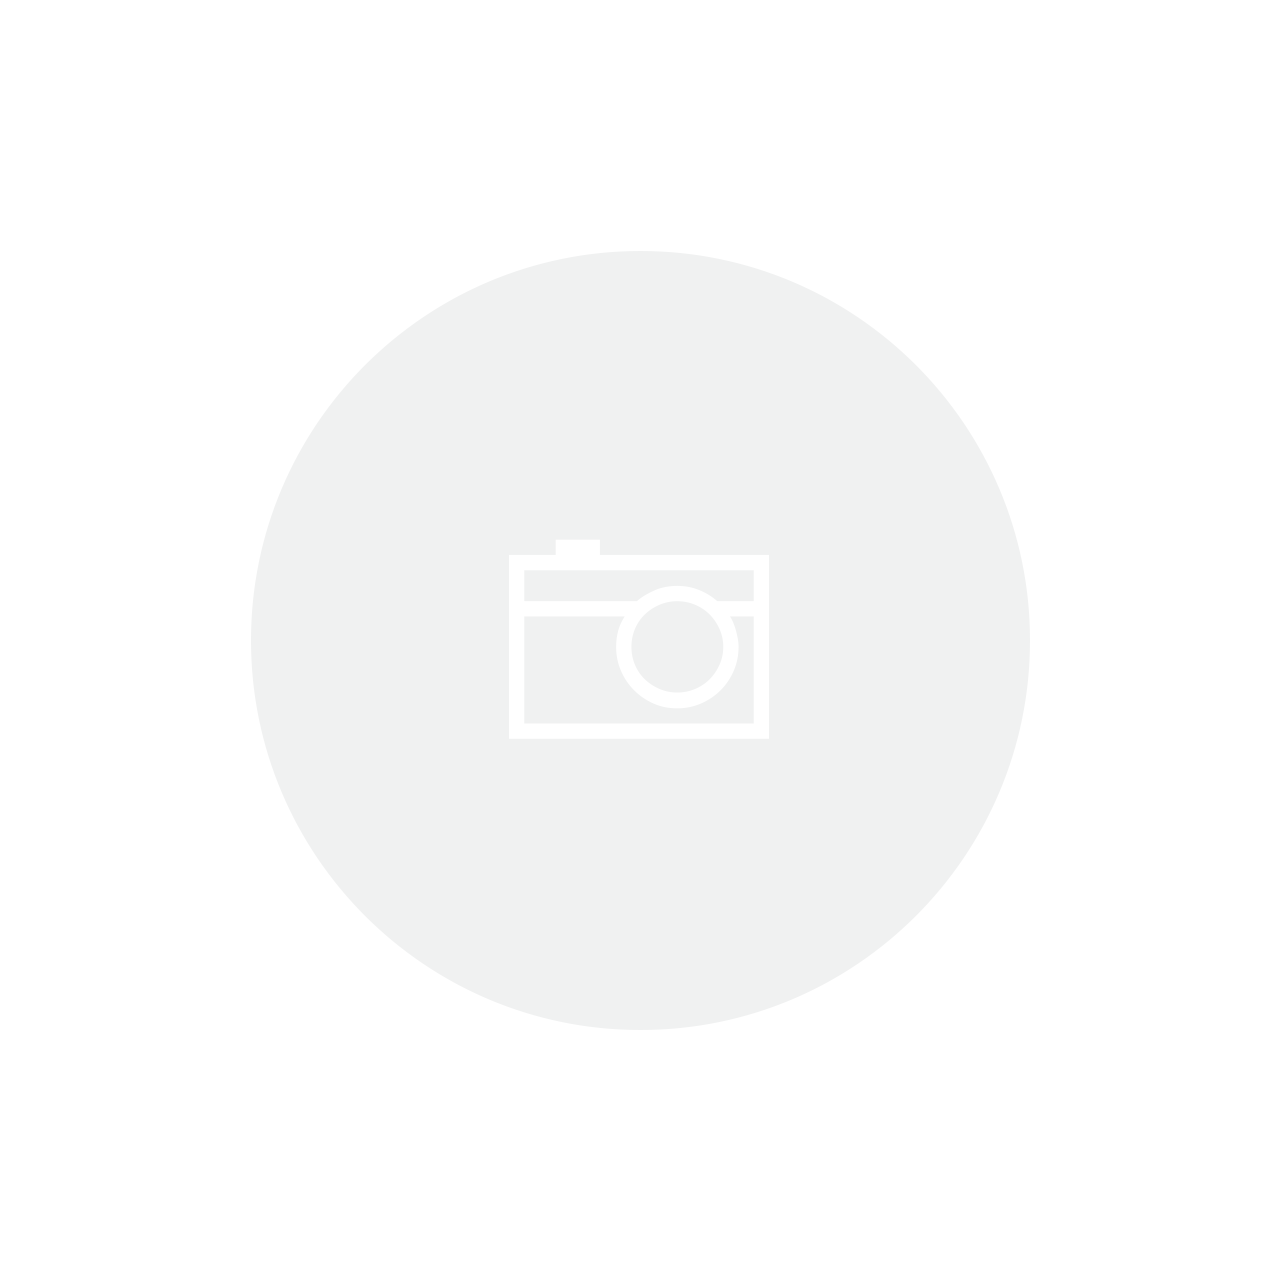 Caçarola Rasa Inox 20cm 2,80 Litros Duo Silicone Tramontina